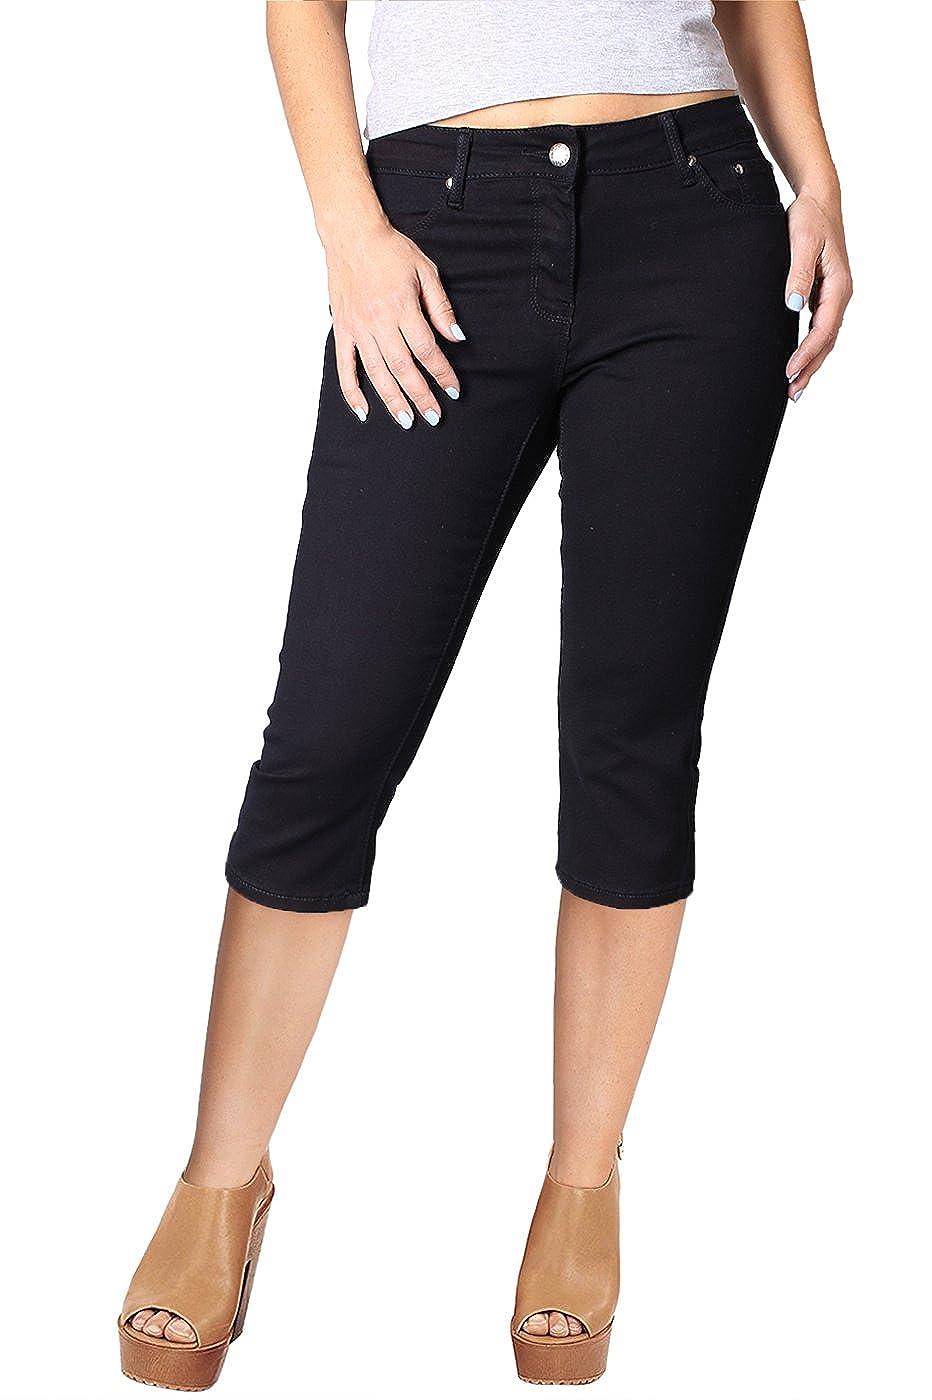 67571851e599c6 Amazon.com  2LUV Women s Stretchy 5 Pocket Skinny Black Capri Jeans   Clothing